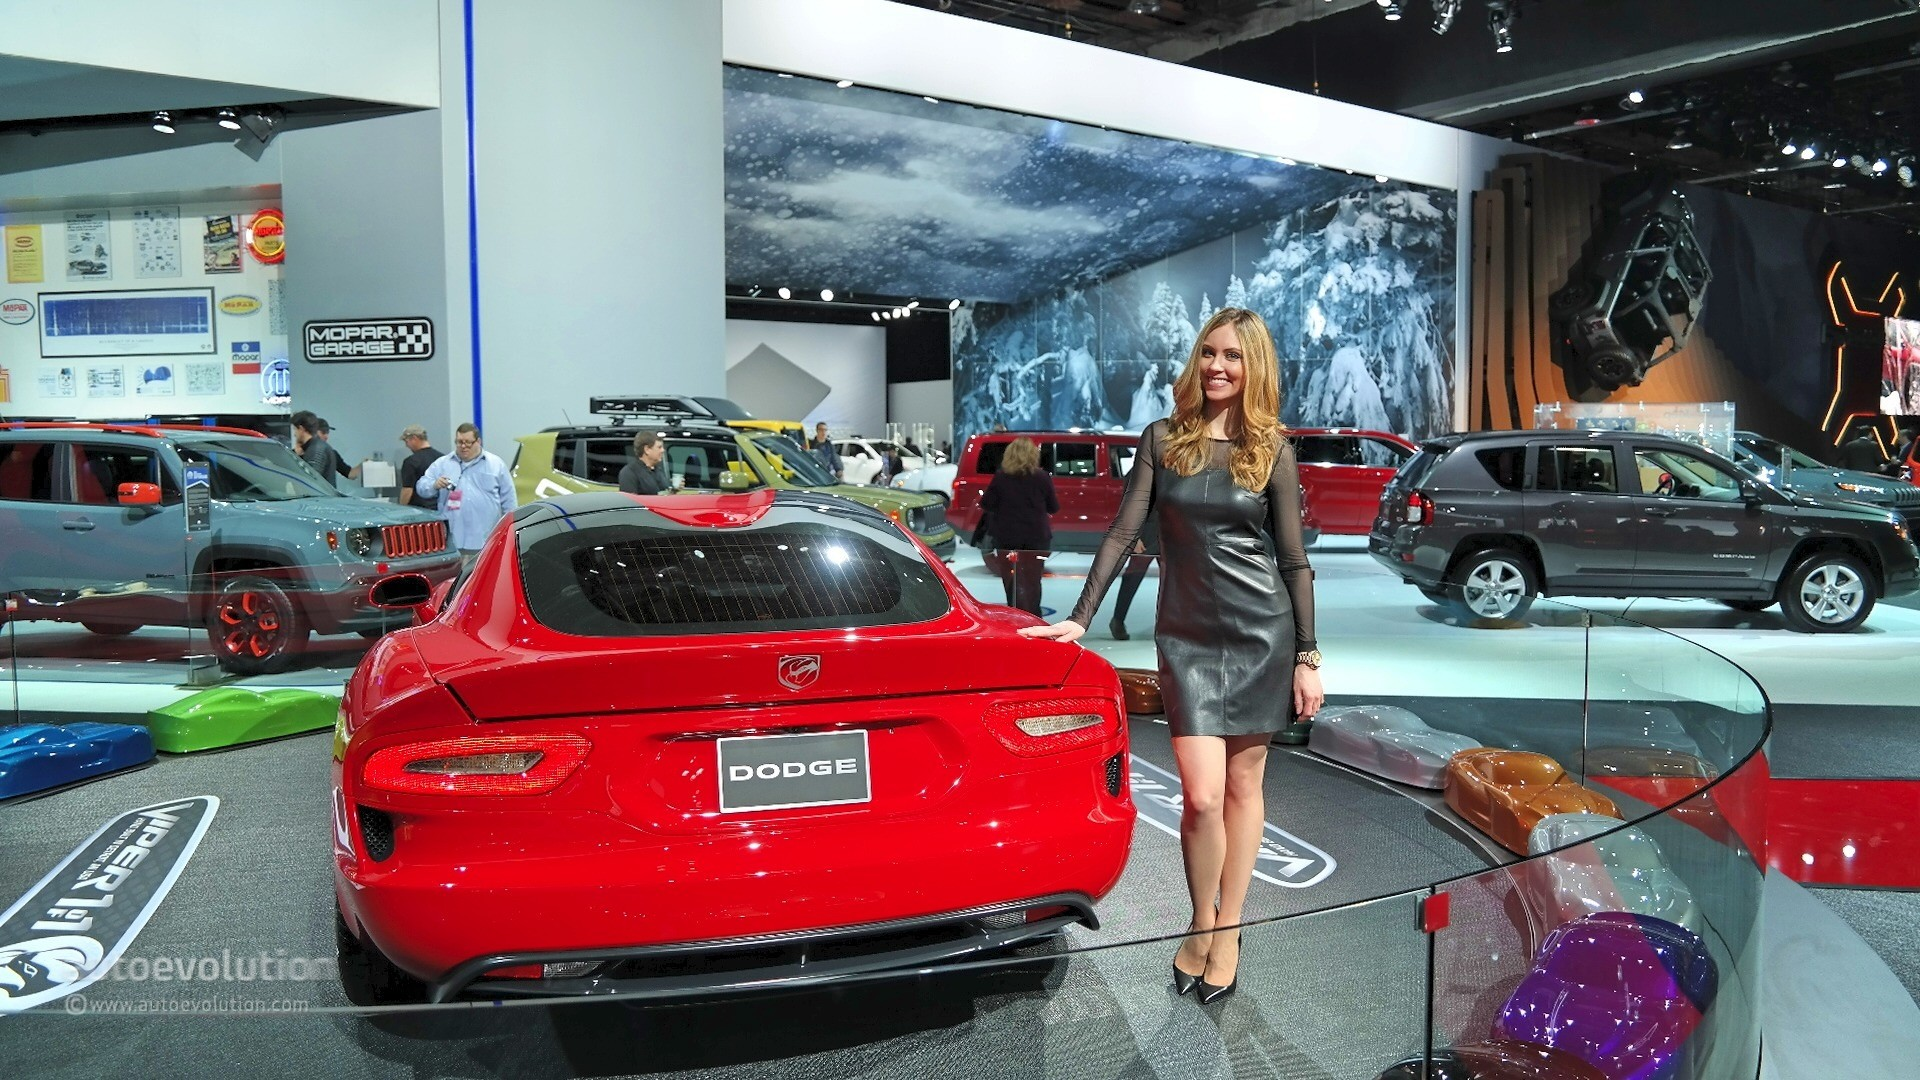 Hot girls of the 2015 detroit auto show autoevolution - Auto motor show ...